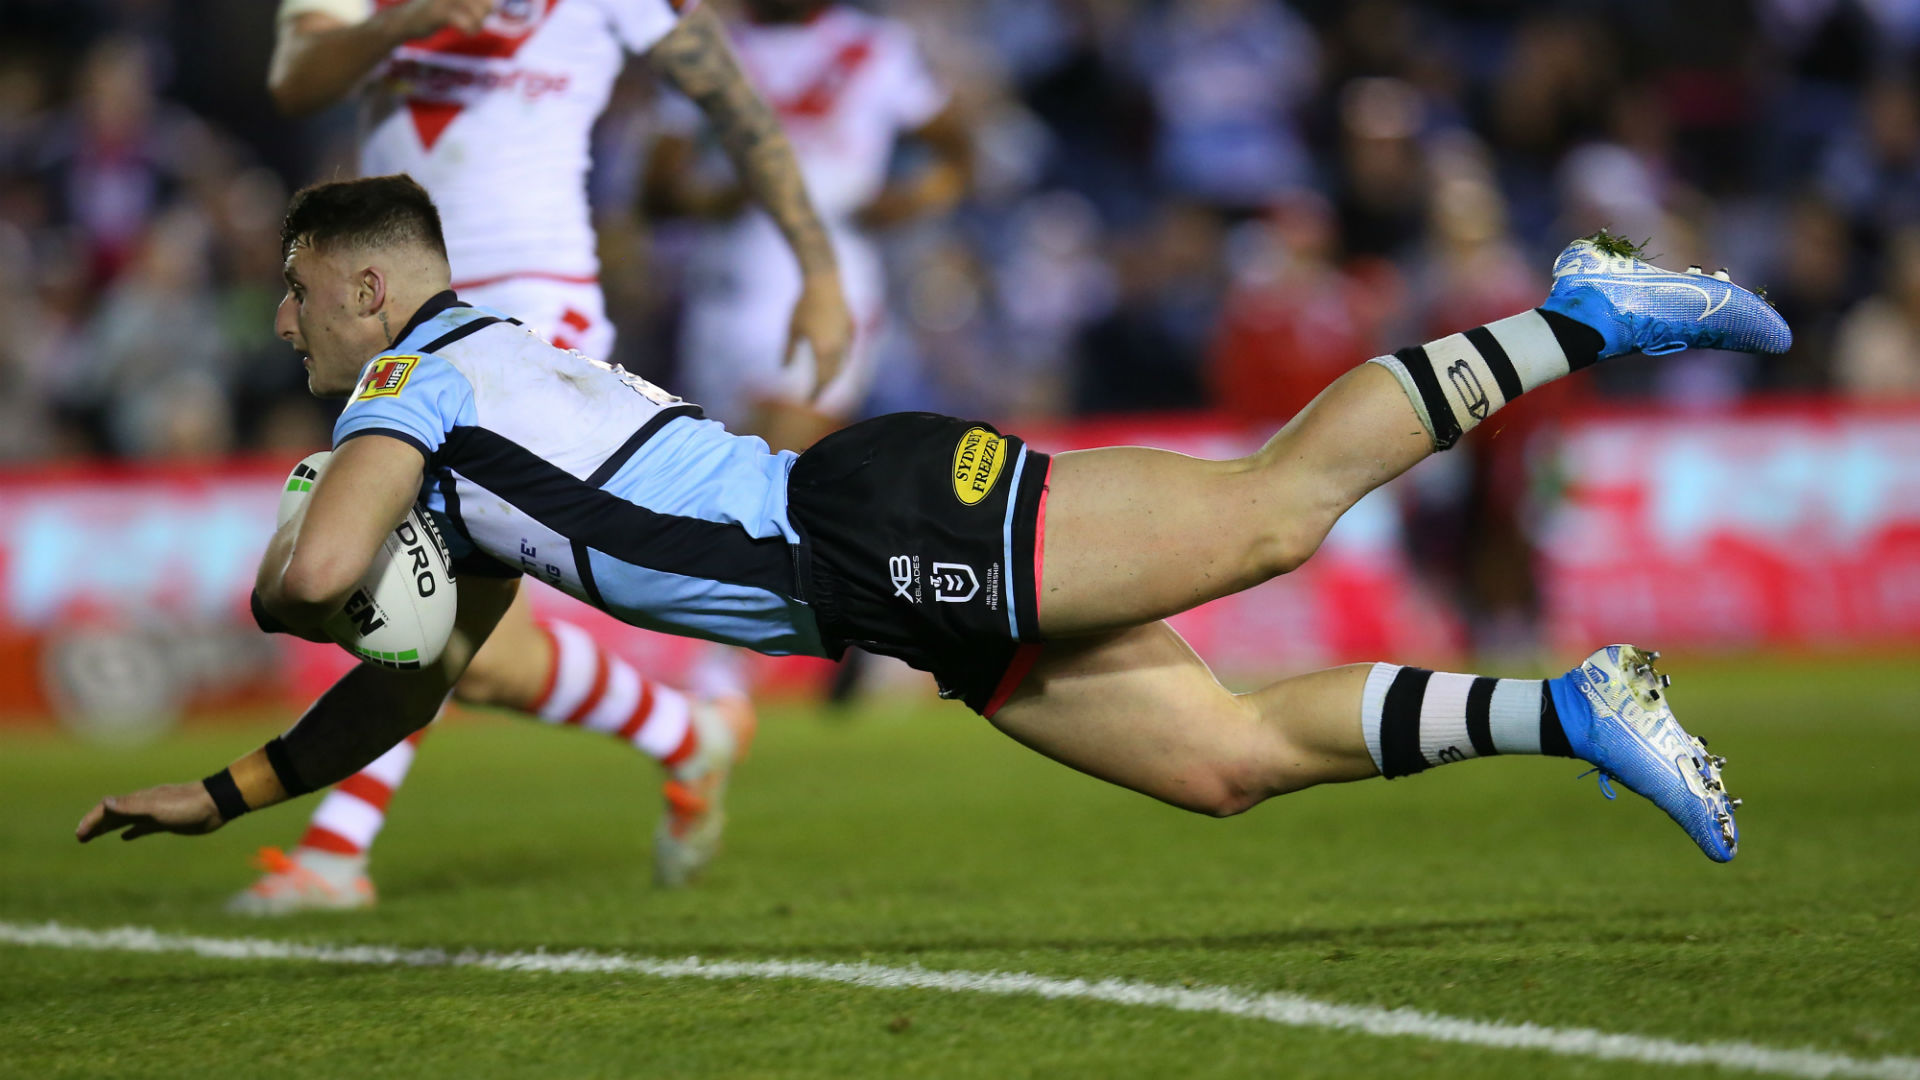 Bronson Xerri scored a late try for Cronulla Sharks